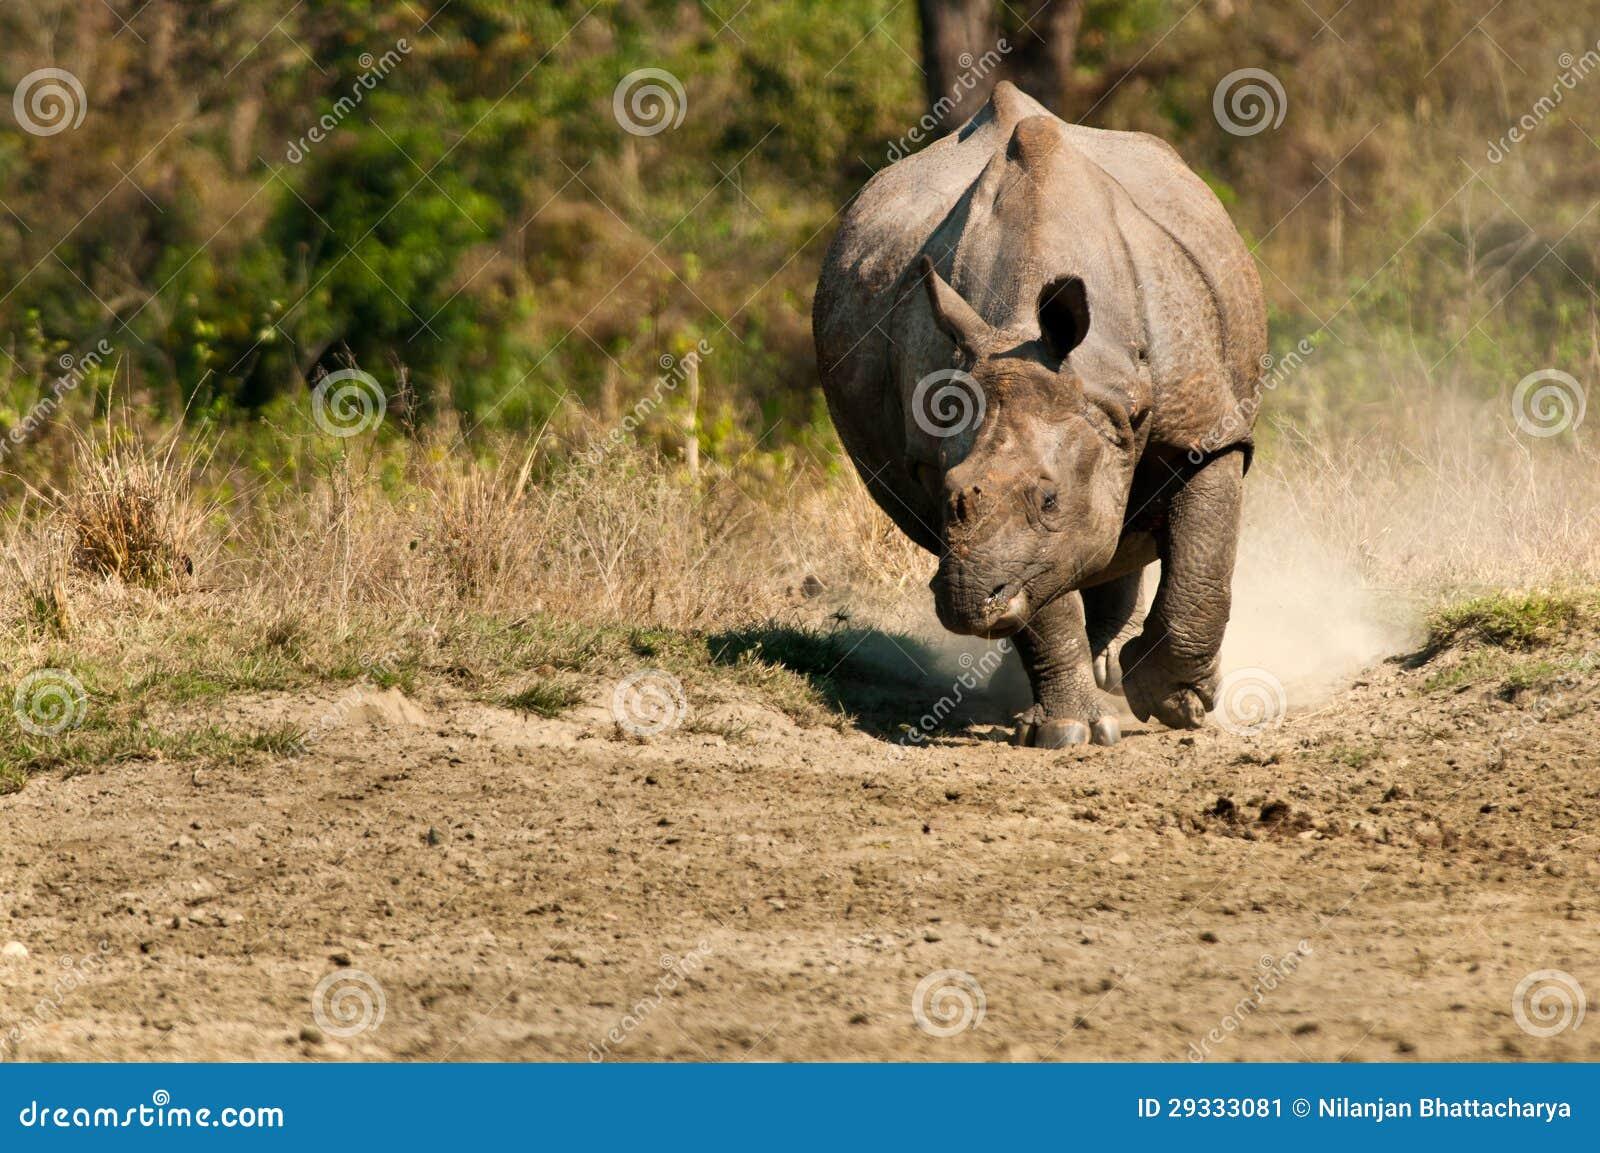 Rhino charging stock image  Image of grassland, grass - 29333081